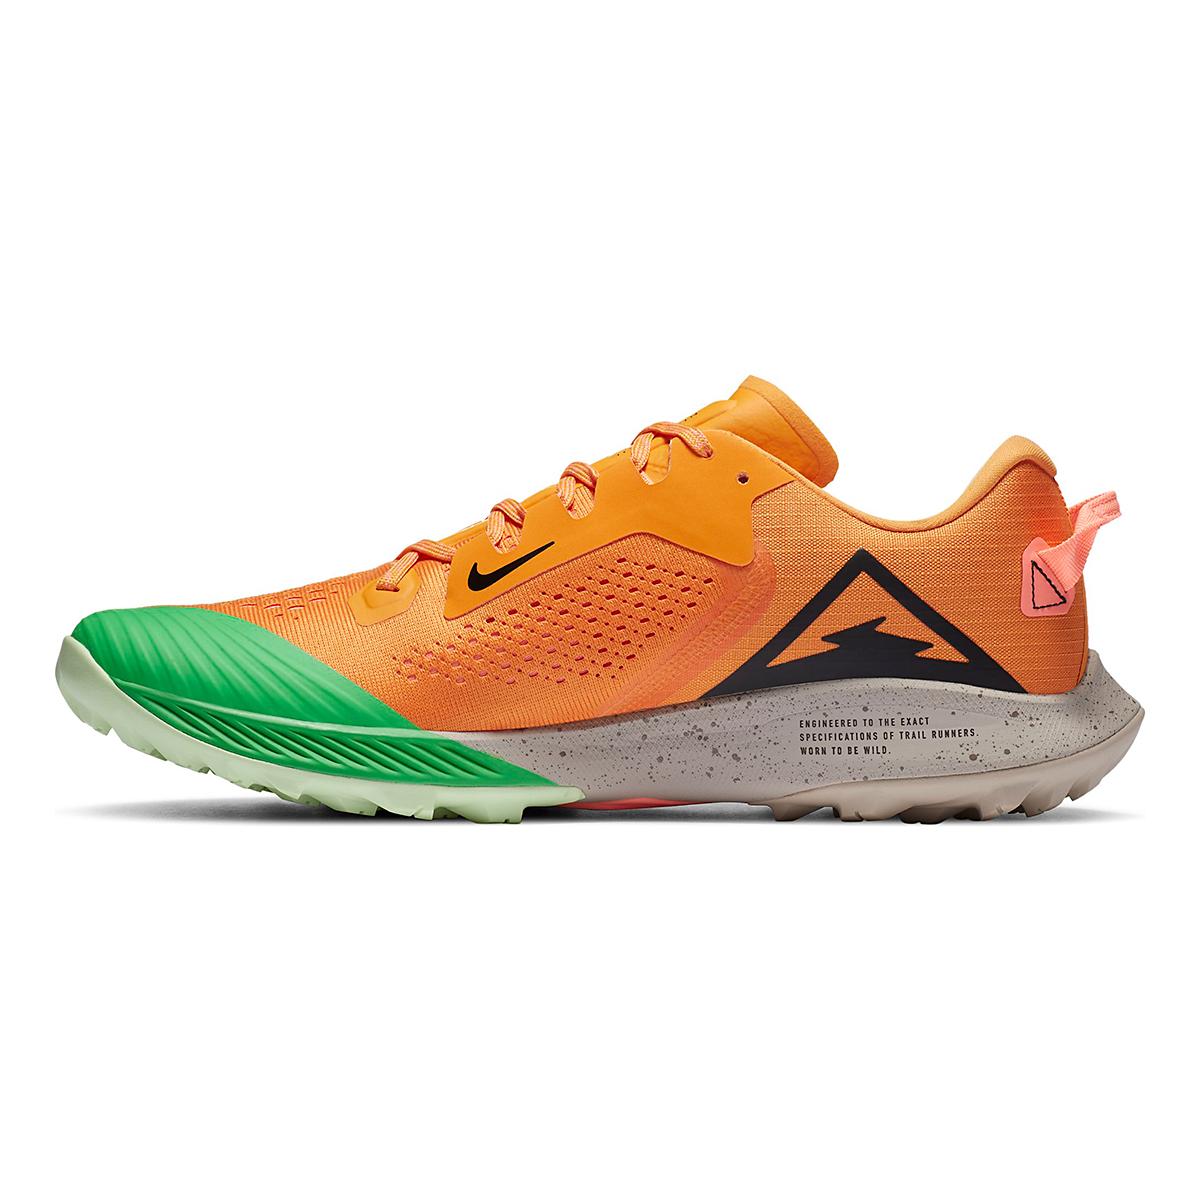 Men's Nike Air Zoom Terra Kiger 6 Trail Running Shoe - Color: Kumquat/Black/Pink Green Spark - Size: 6 - Width: Regular, Kumquat/Black/Pink Green Spark, large, image 2